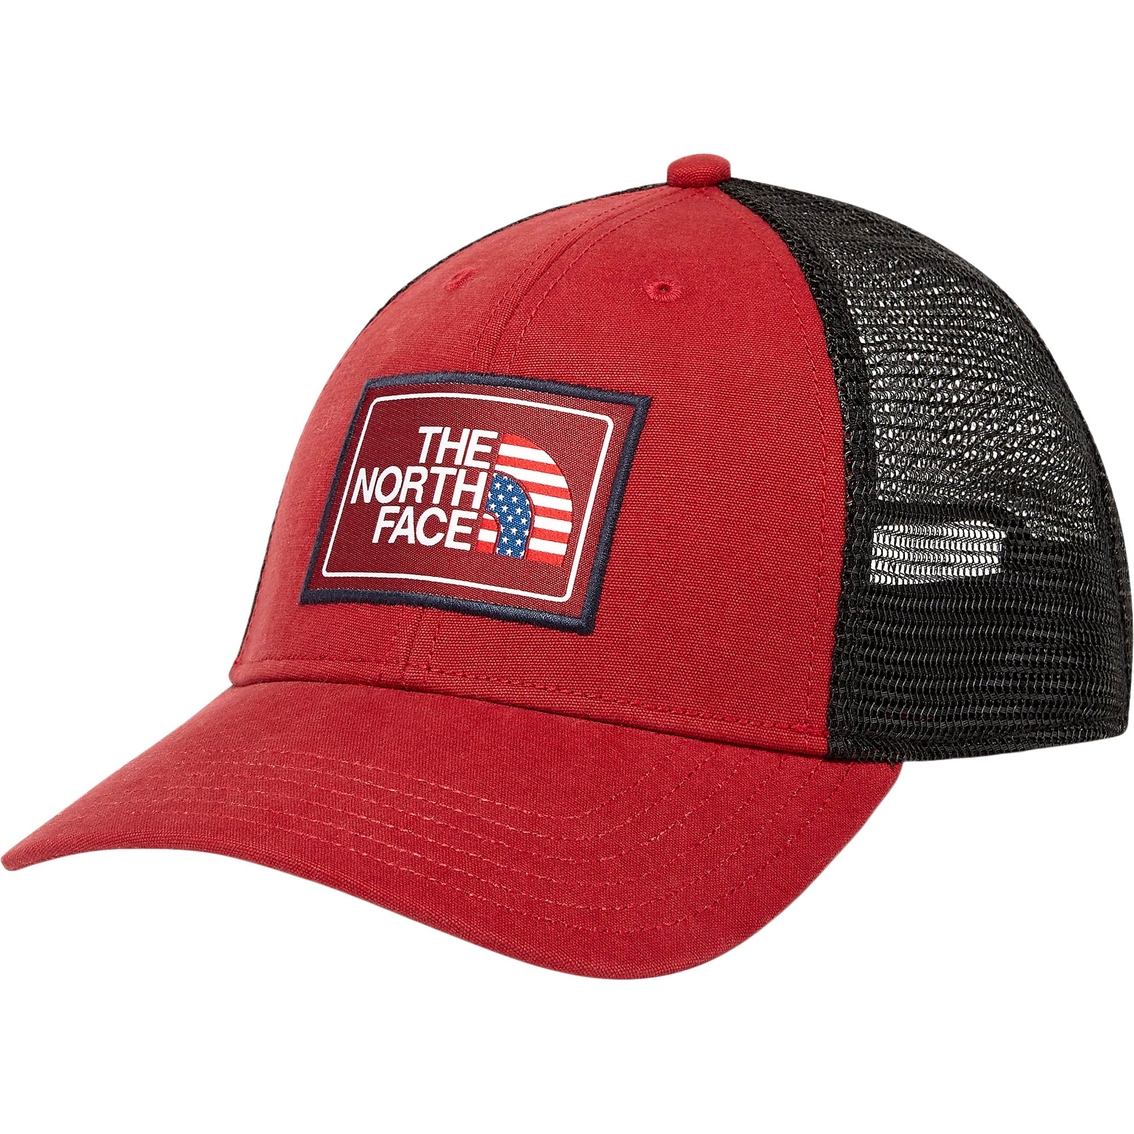 fe48372e827ba The North Face Americana Trucker Hat